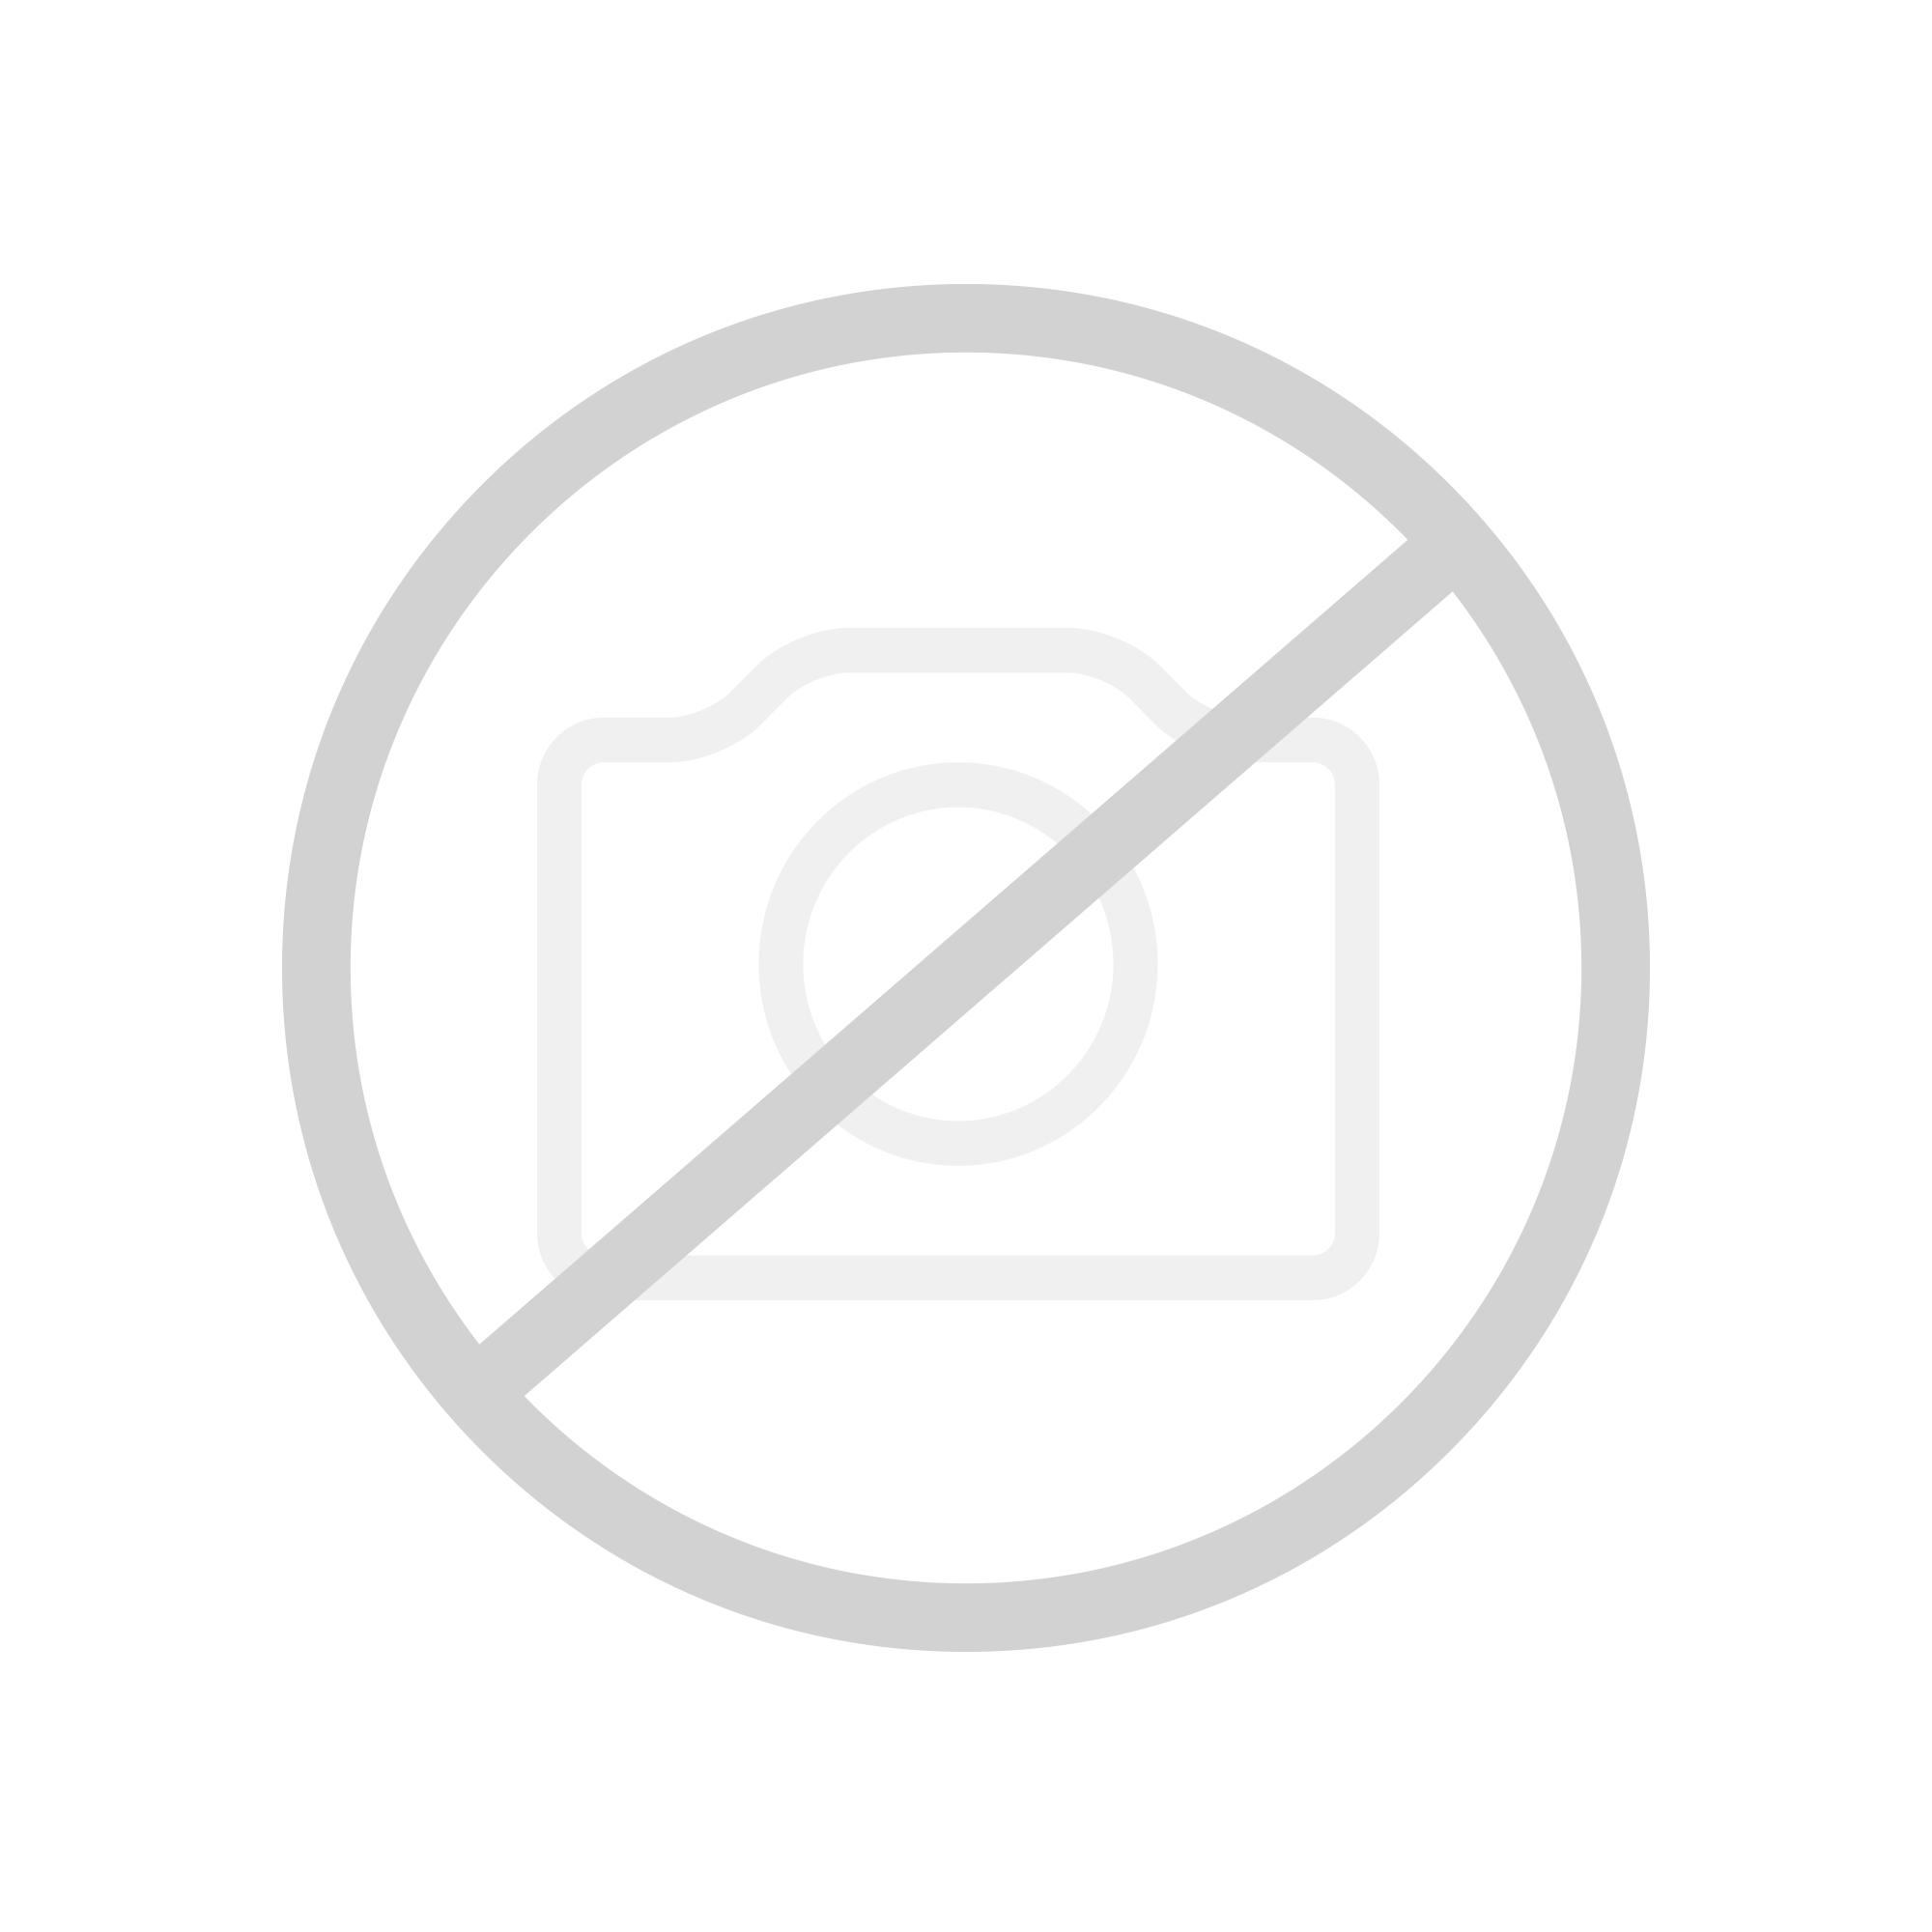 keuco ilook move kosmetikspiegel mit unterputztransformator 17613019000 reuter onlineshop. Black Bedroom Furniture Sets. Home Design Ideas